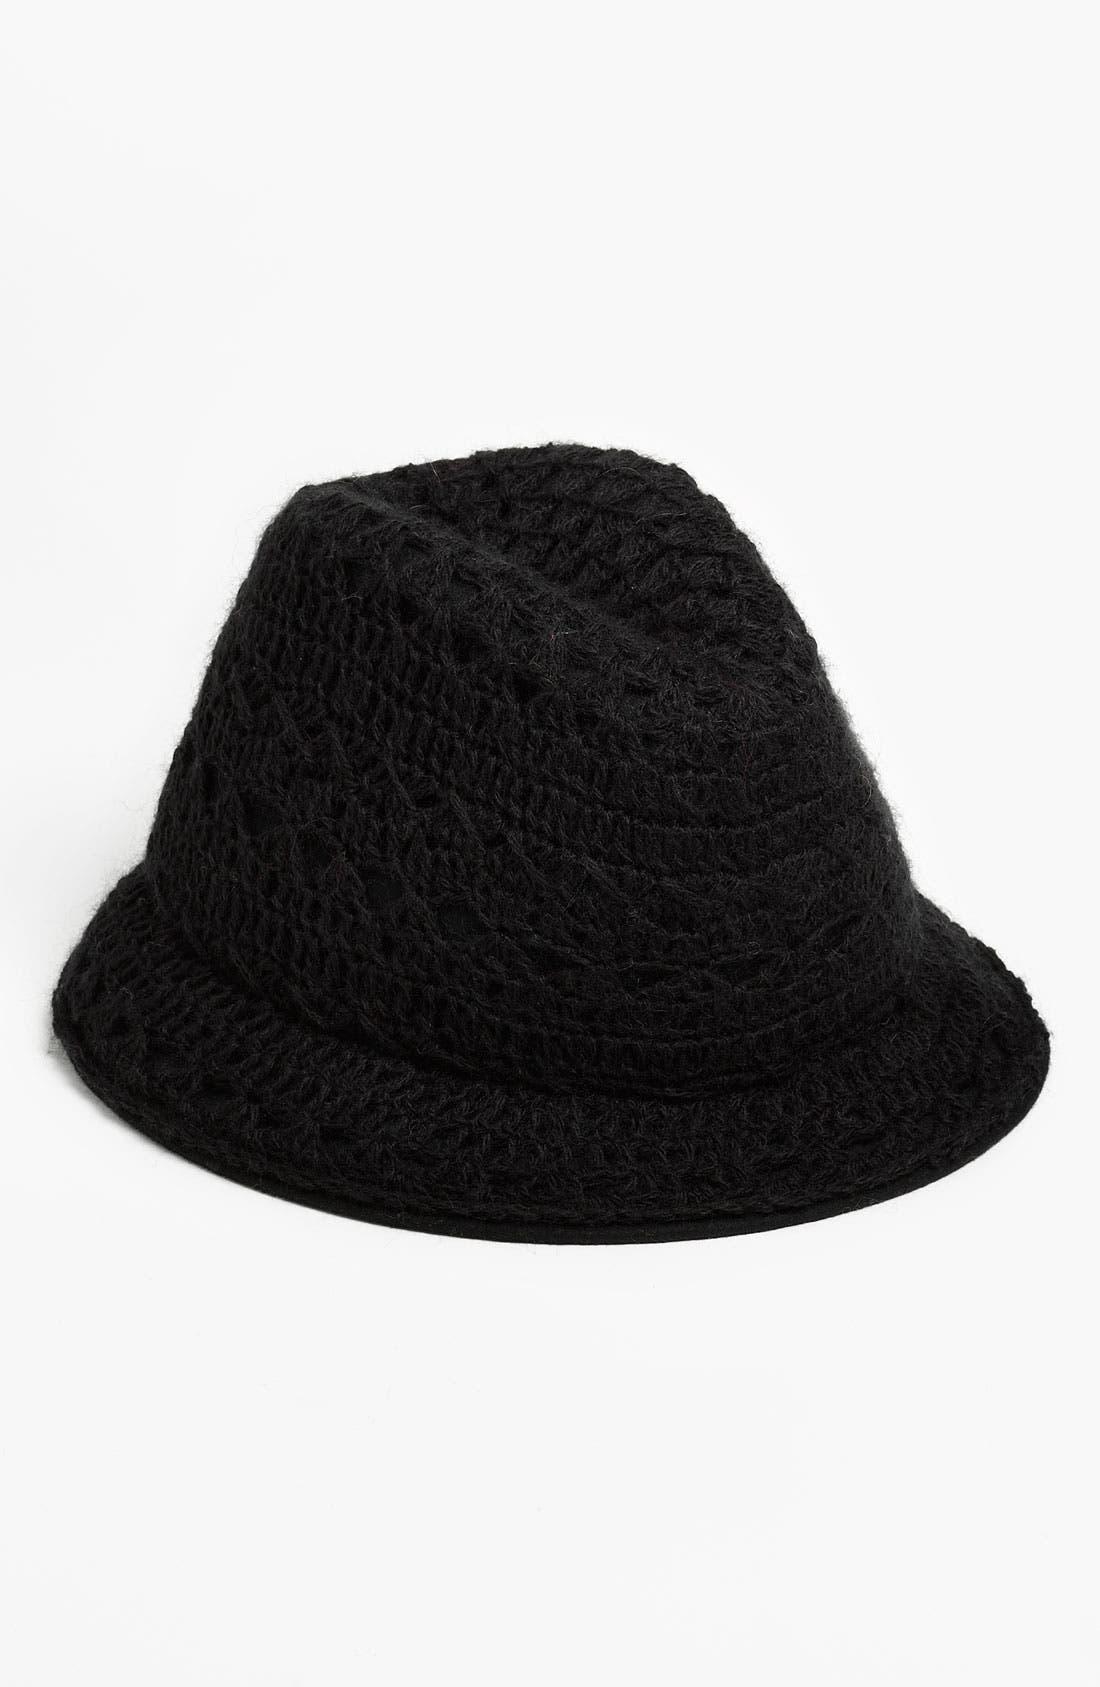 Alternate Image 1 Selected - Tarnish Crochet Fedora